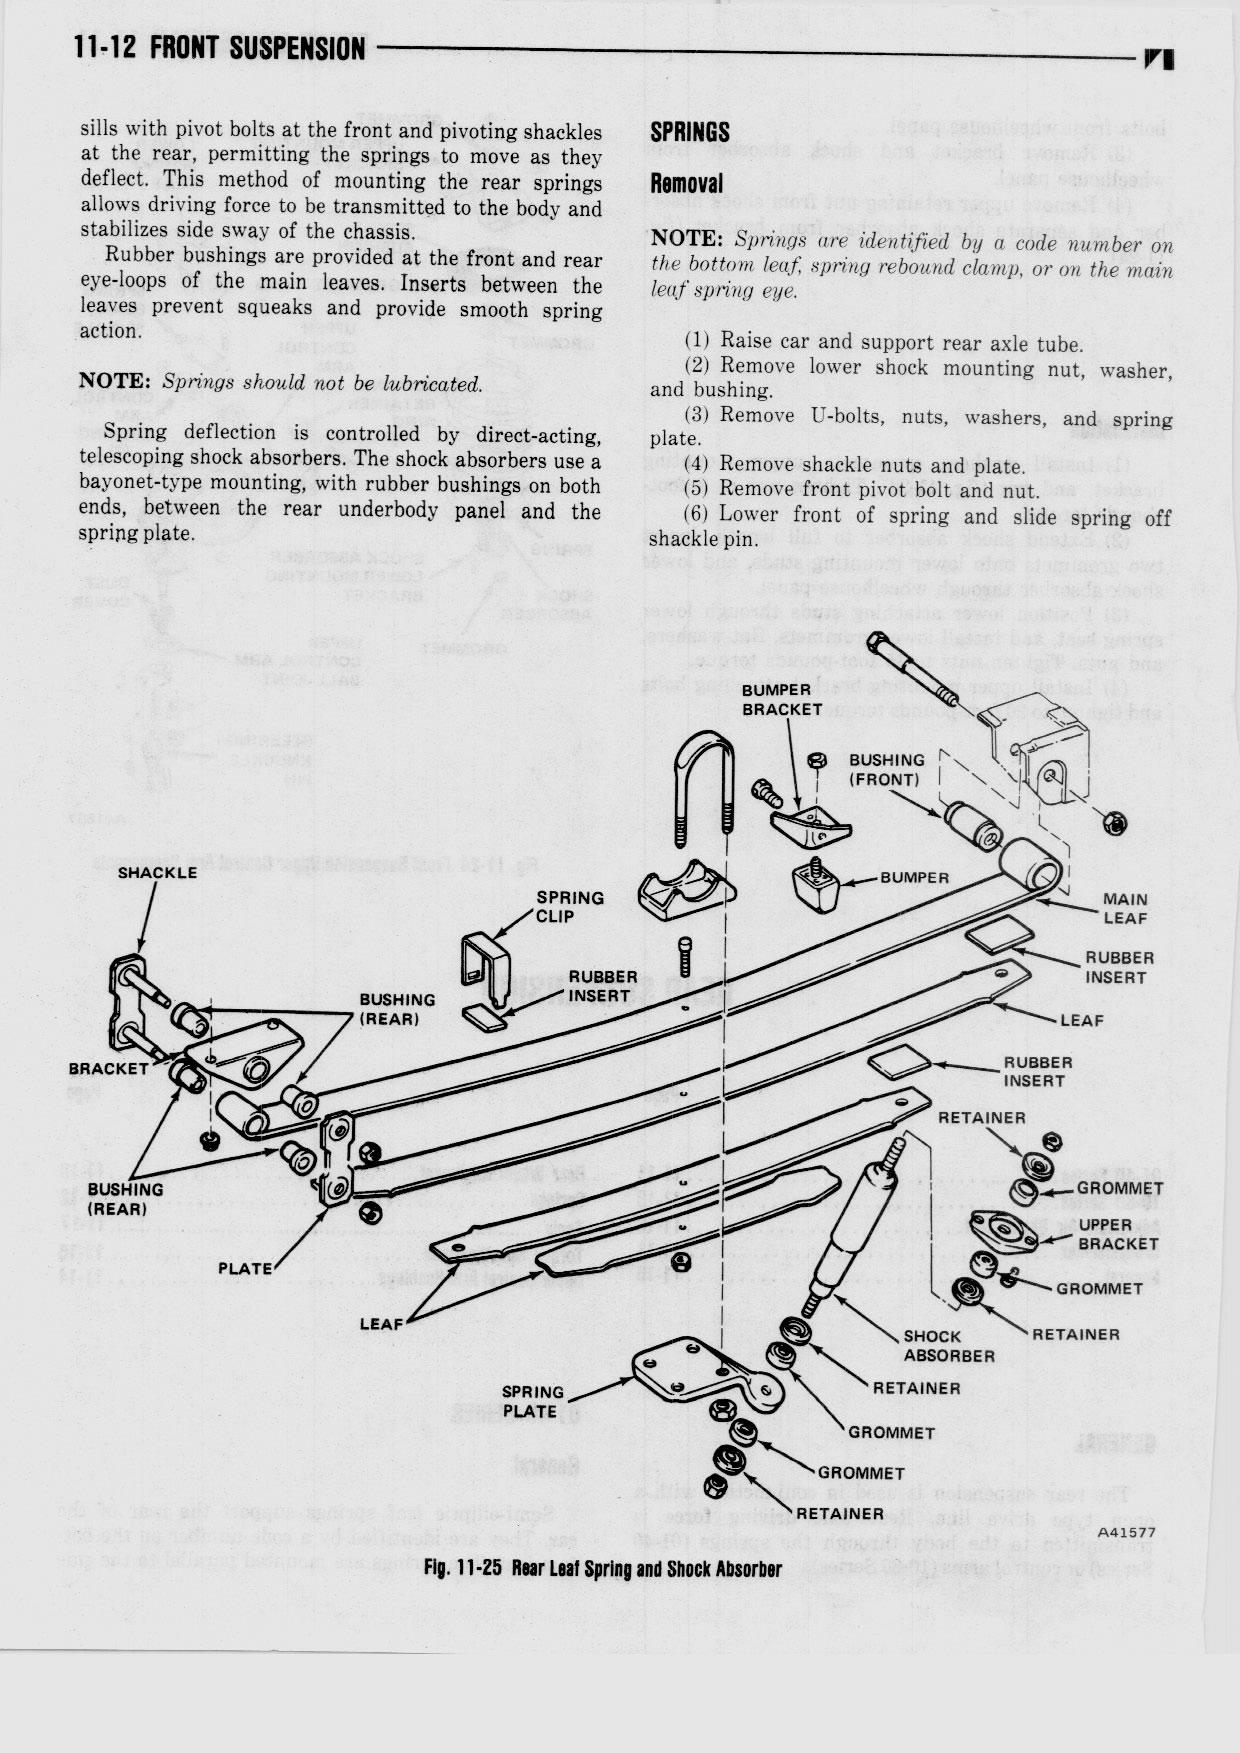 11 Suspension / 1976 AMC Technical Service Manual_Page_650.jpg